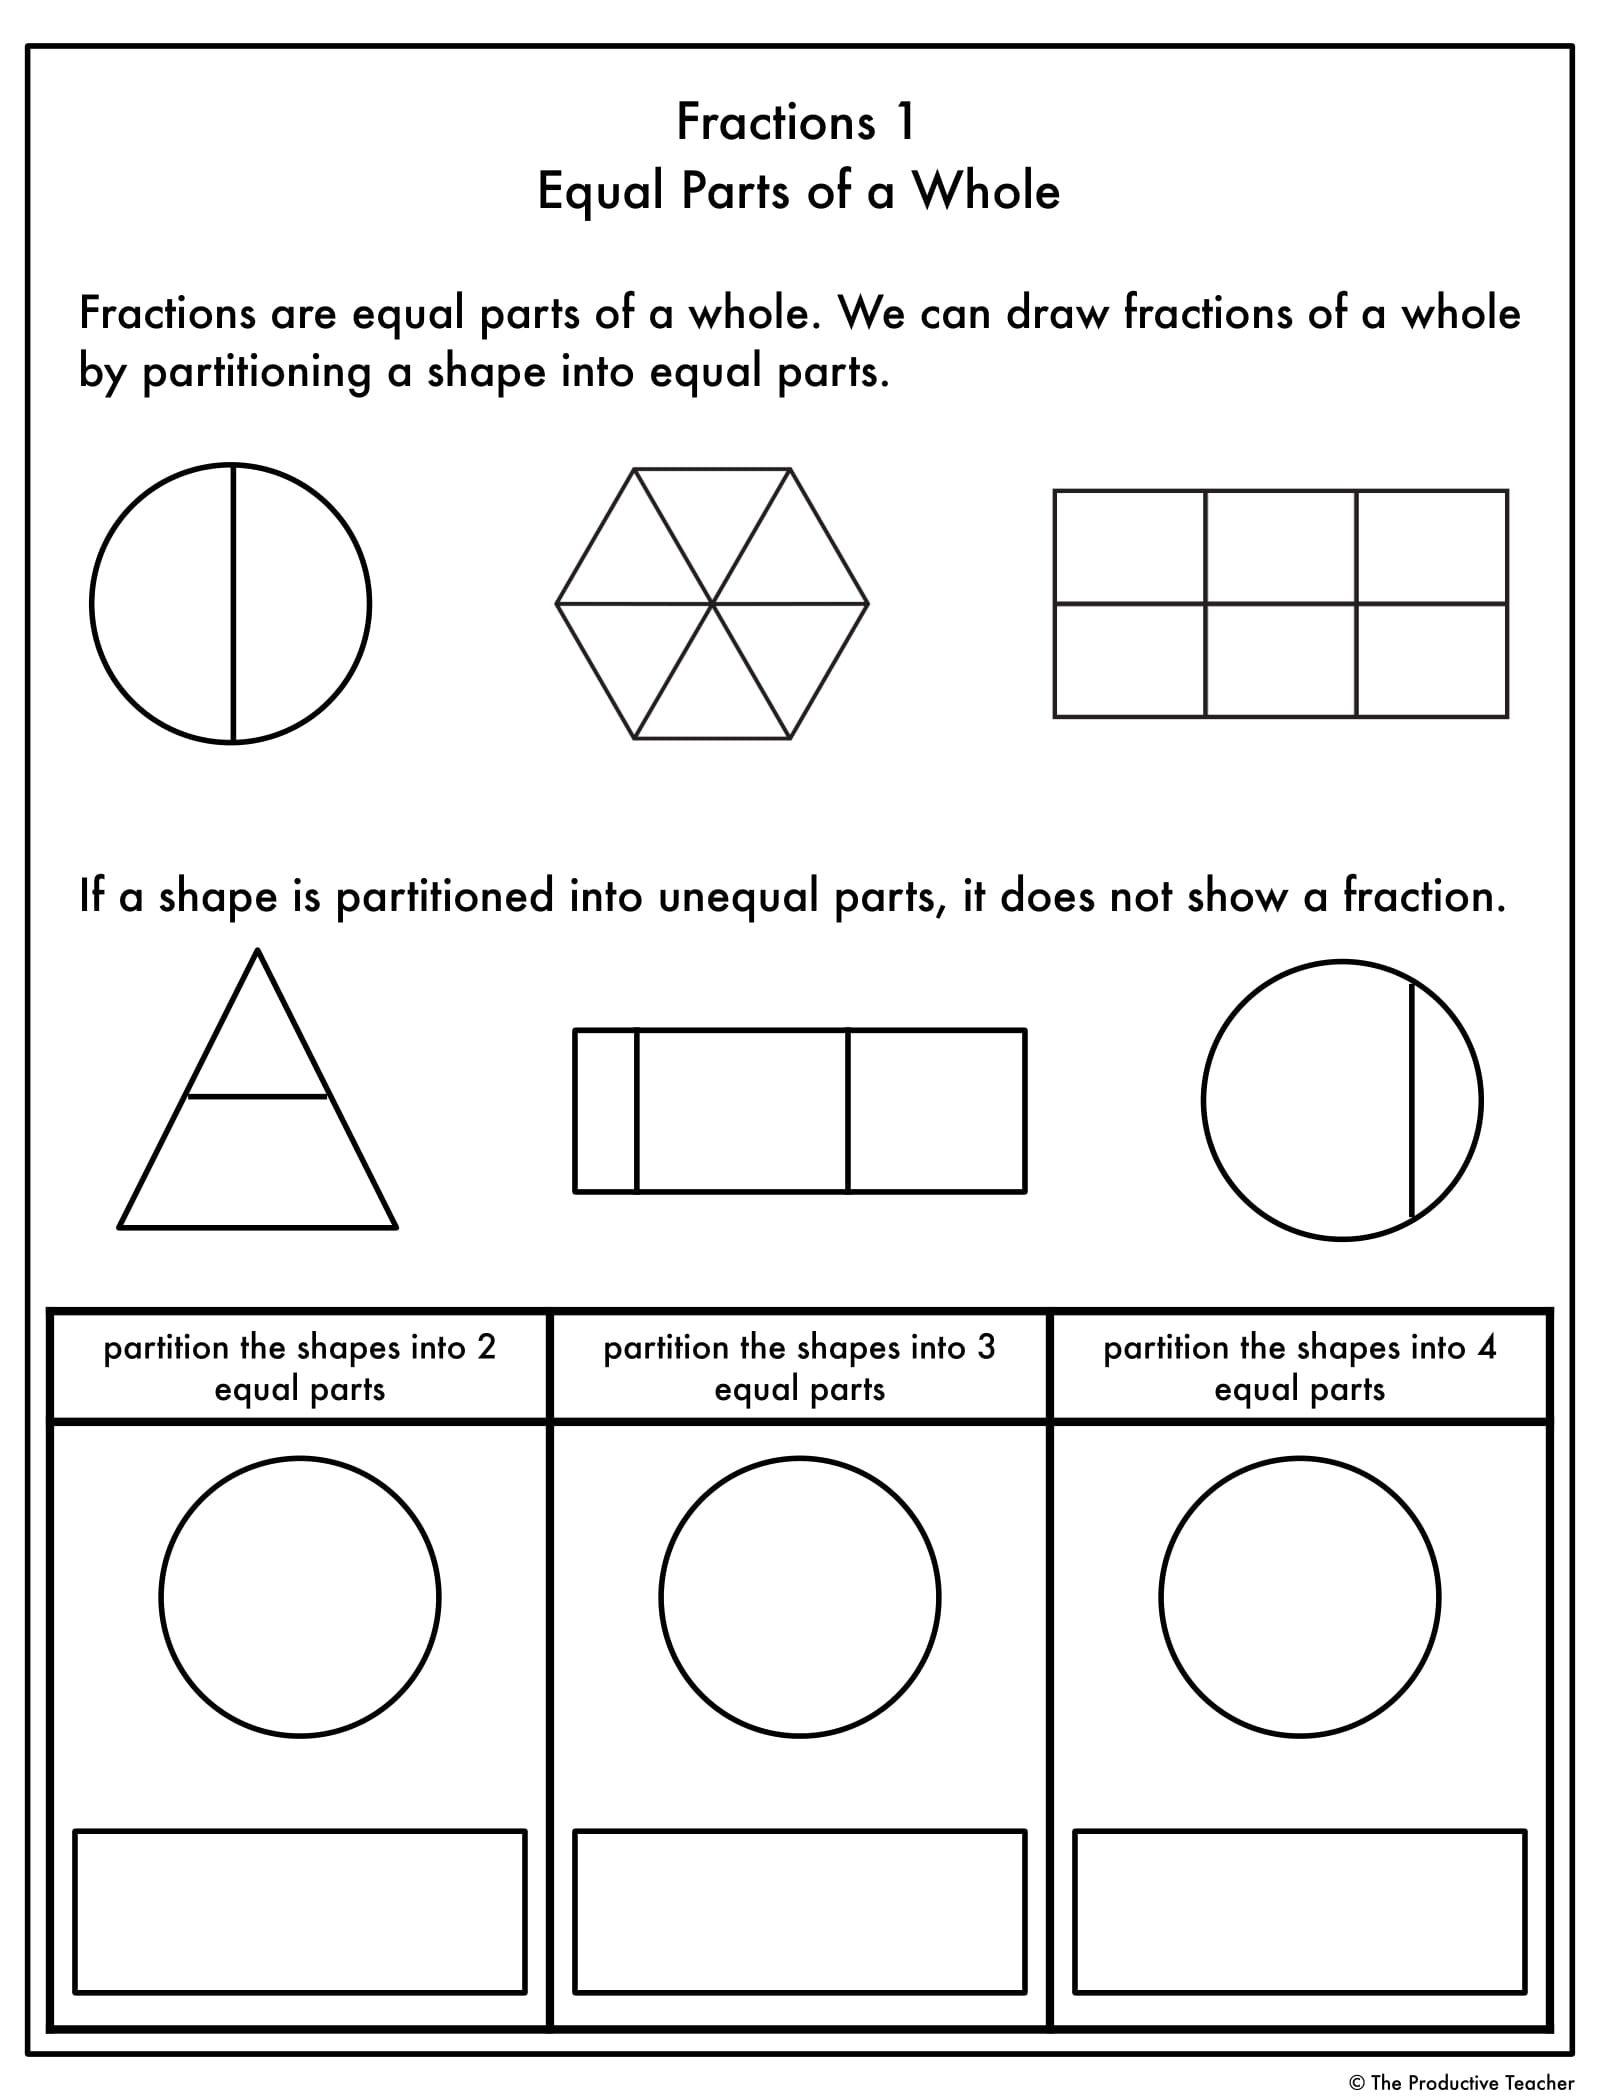 Fractions Worksheet Progression In 2020 Fractions Worksheets Math Fractions Worksheets Free Math Worksheets